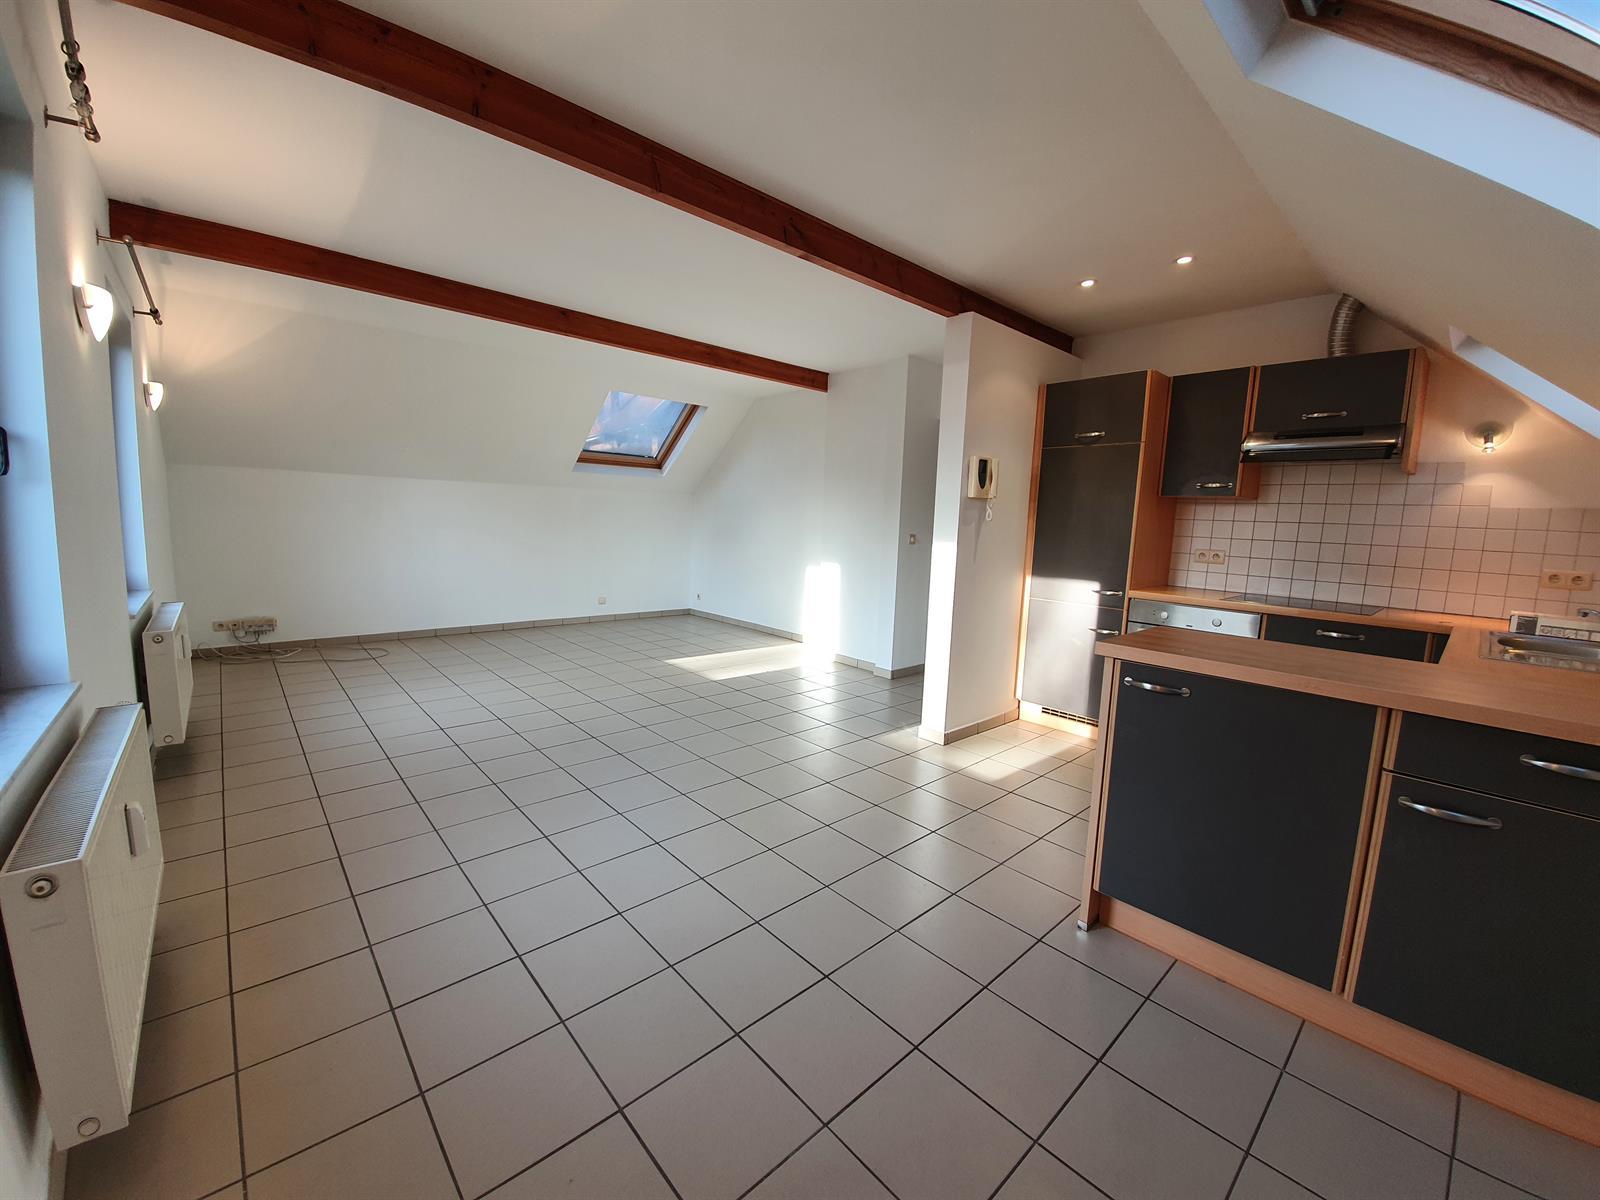 Appartement - Chaumont-Gistoux - #4226214-3